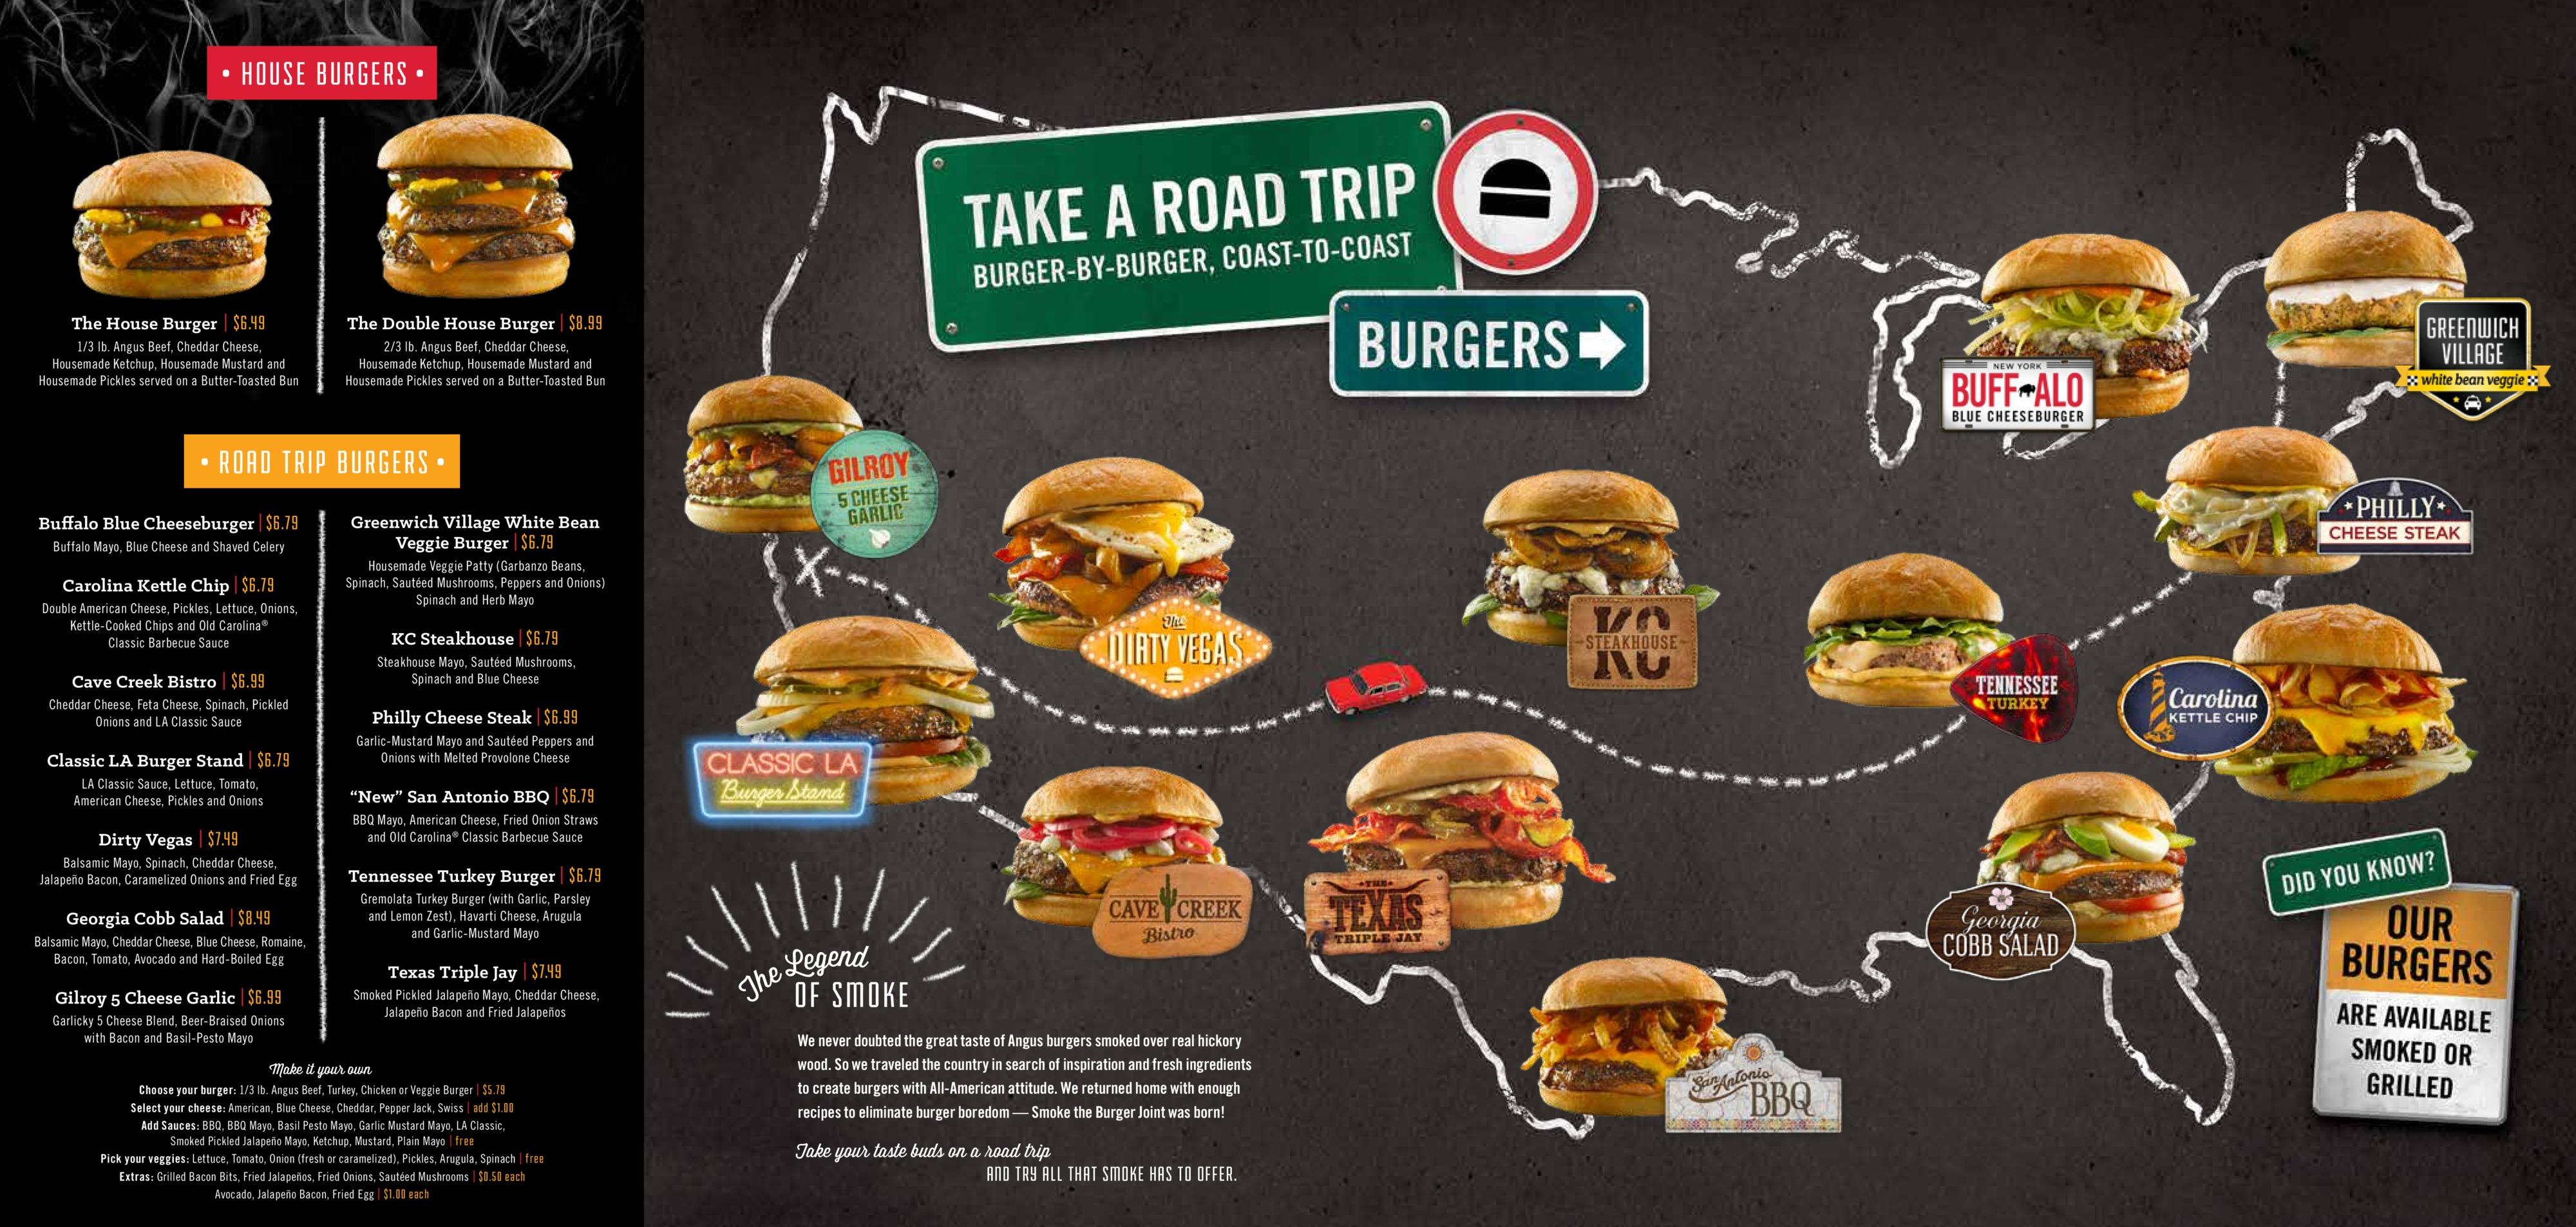 Smoke The Burger Joint North Canton OH Visitorfuncom - Burger joint us map